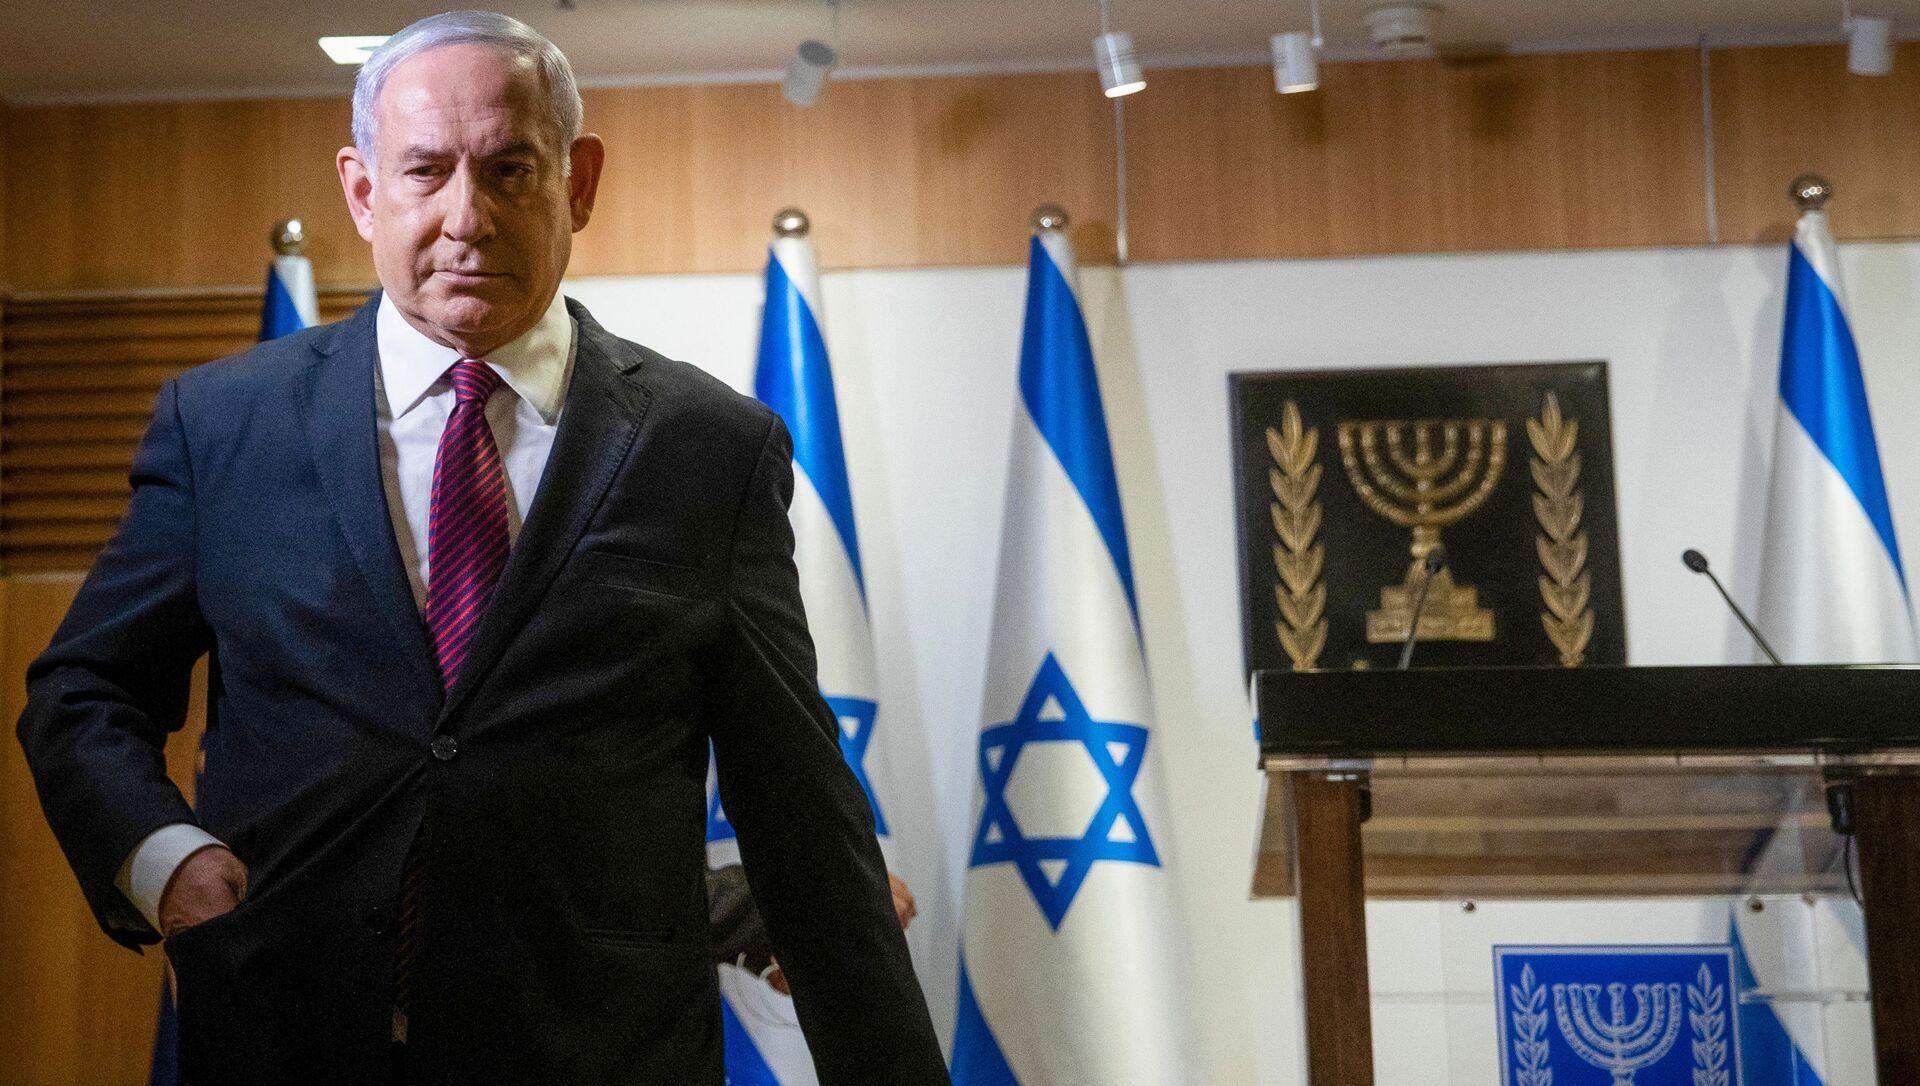 In this file photo taken on December 22, 2020 Israeli Prime Minister Benjamin Netanyahu leaves after a speech at the Knesset (Israeli Parliament) in Jerusalem - Sputnik International, 1920, 01.08.2021